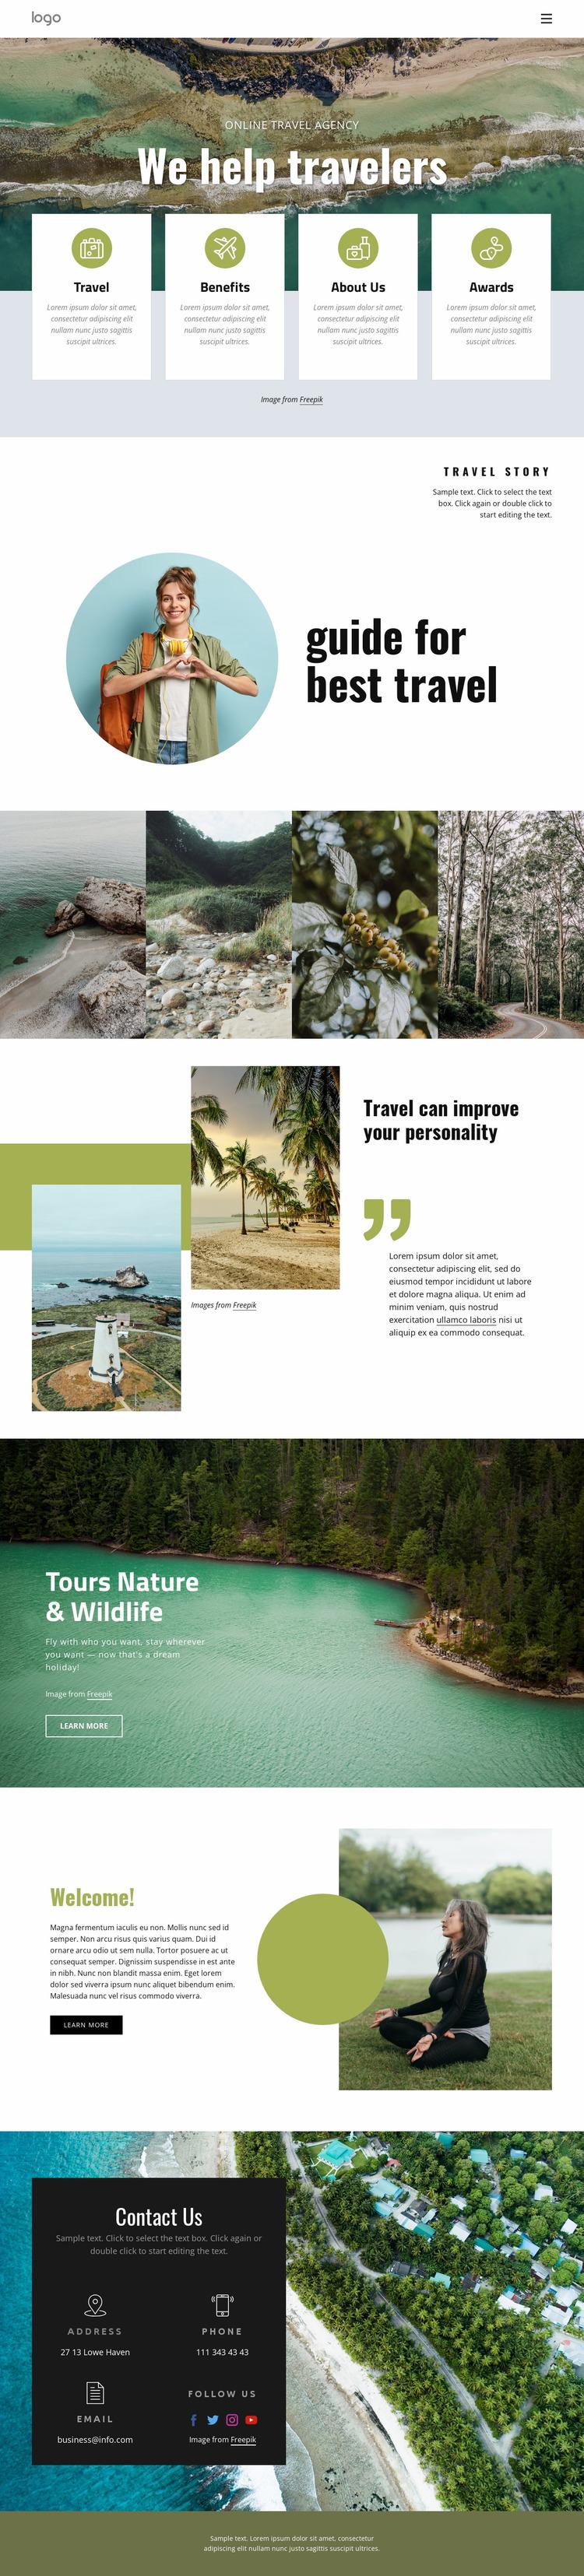 We help manage your trip Website Mockup